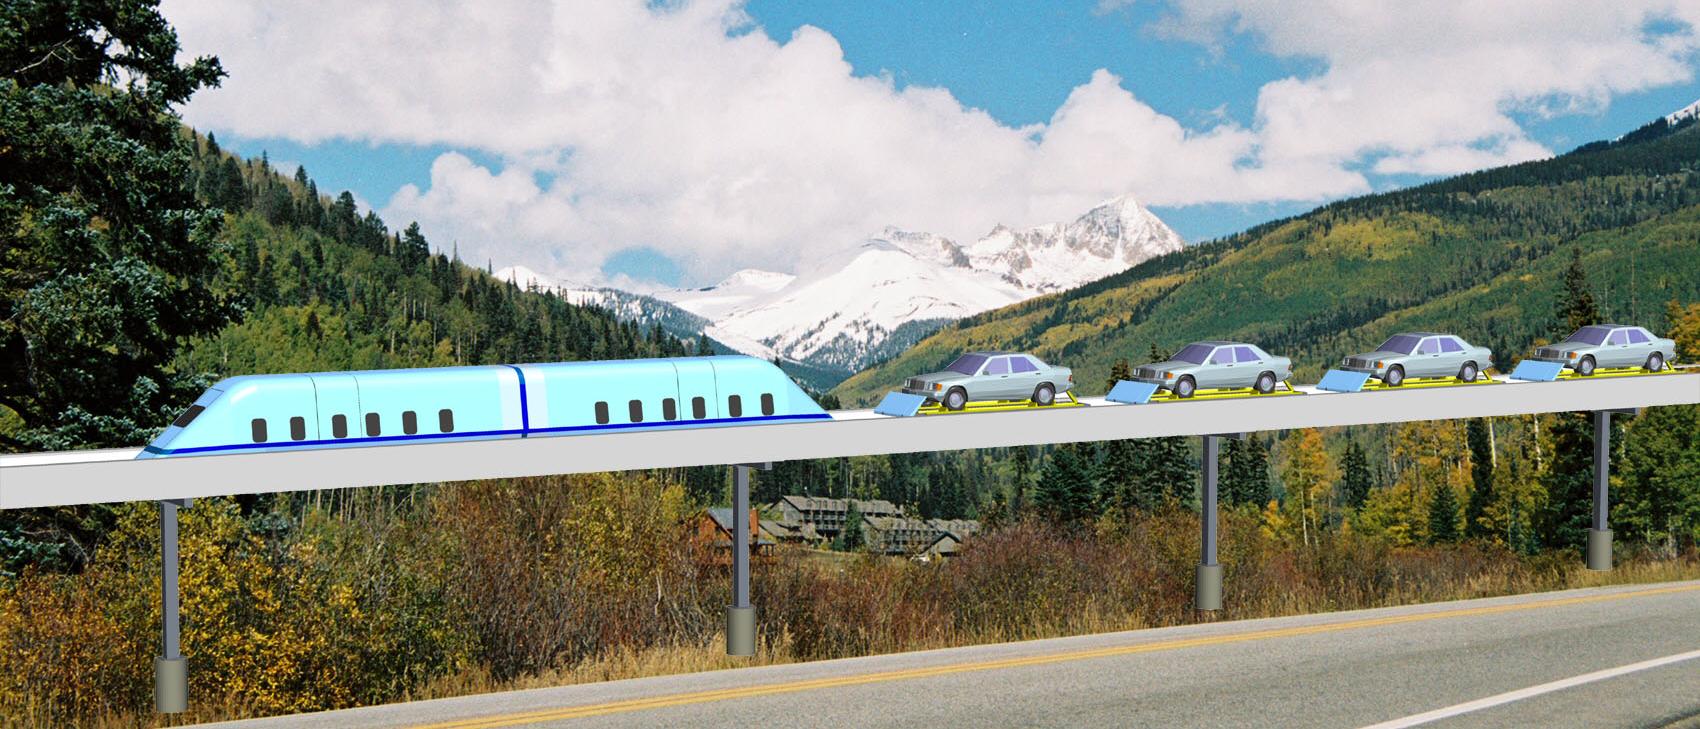 High speed CarLiner™ car-train service